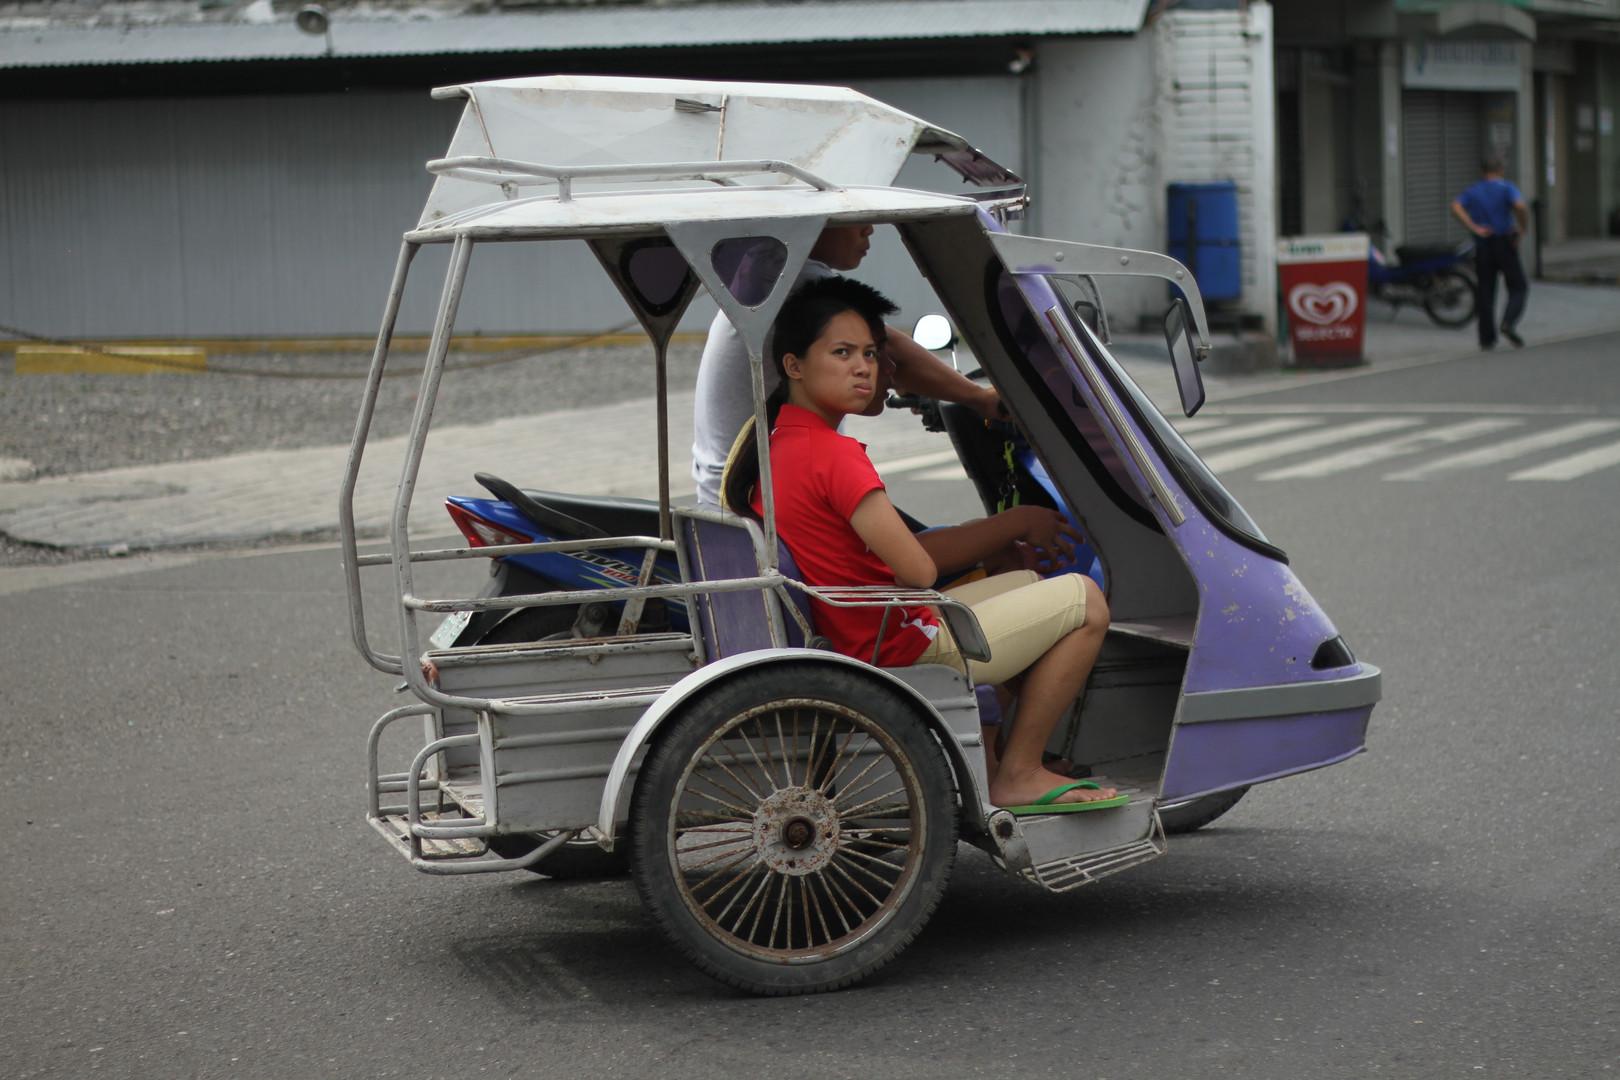 Trike in Traffic